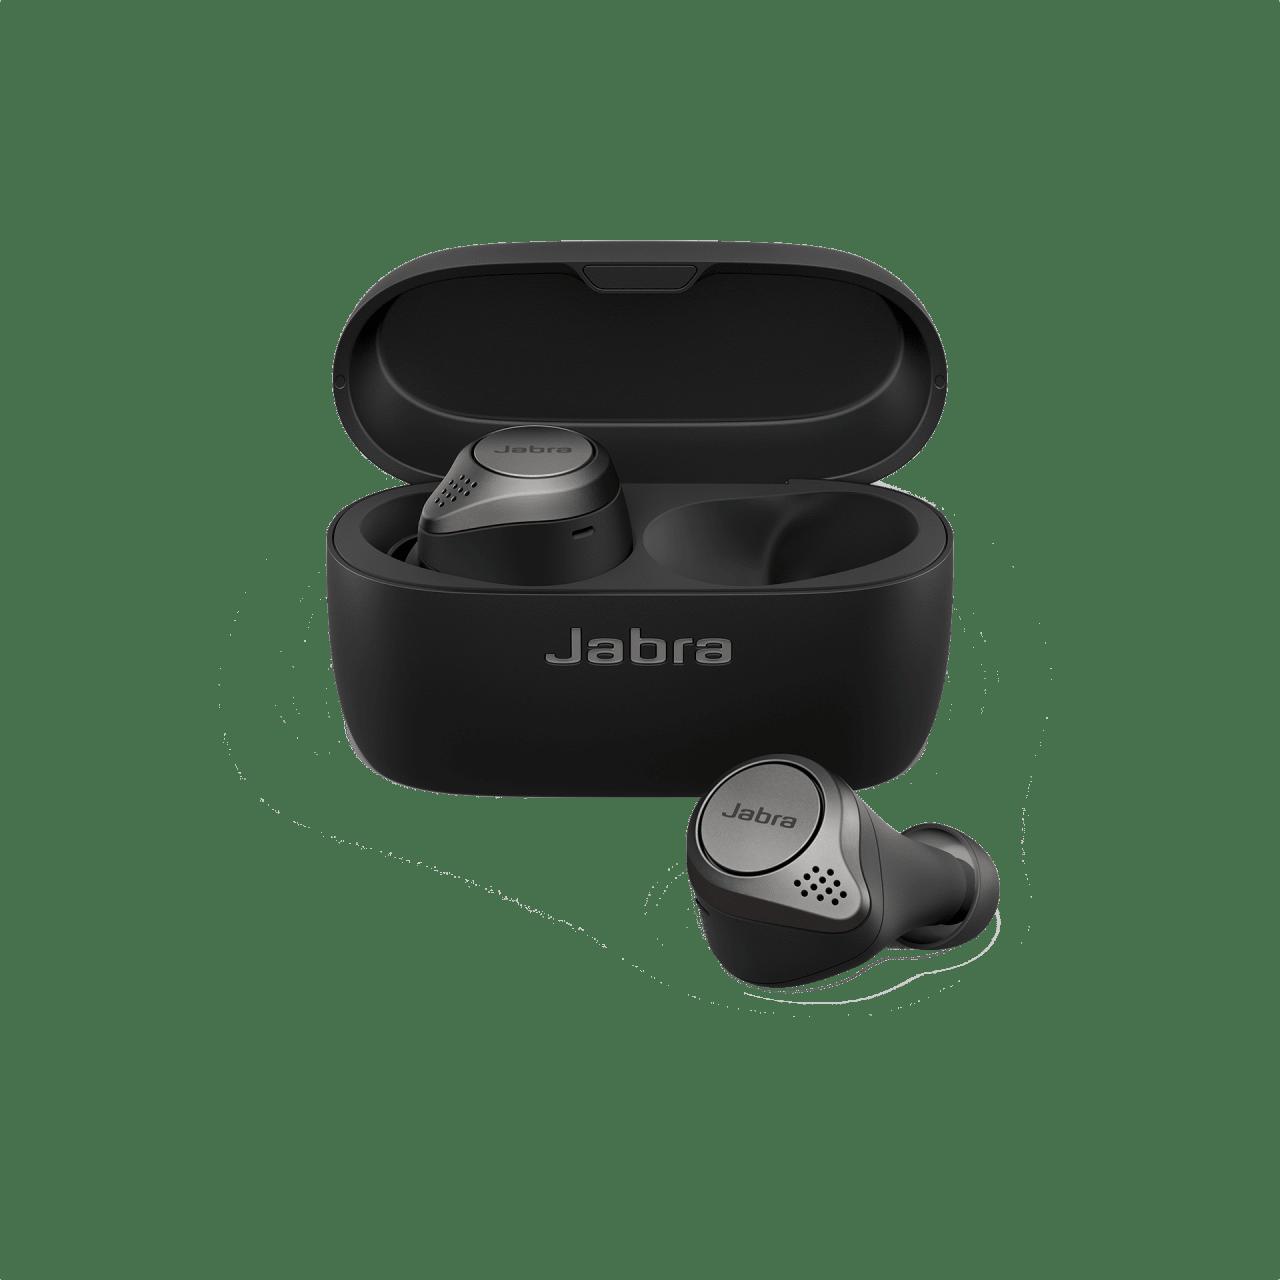 Black Jabra Elite75t.2